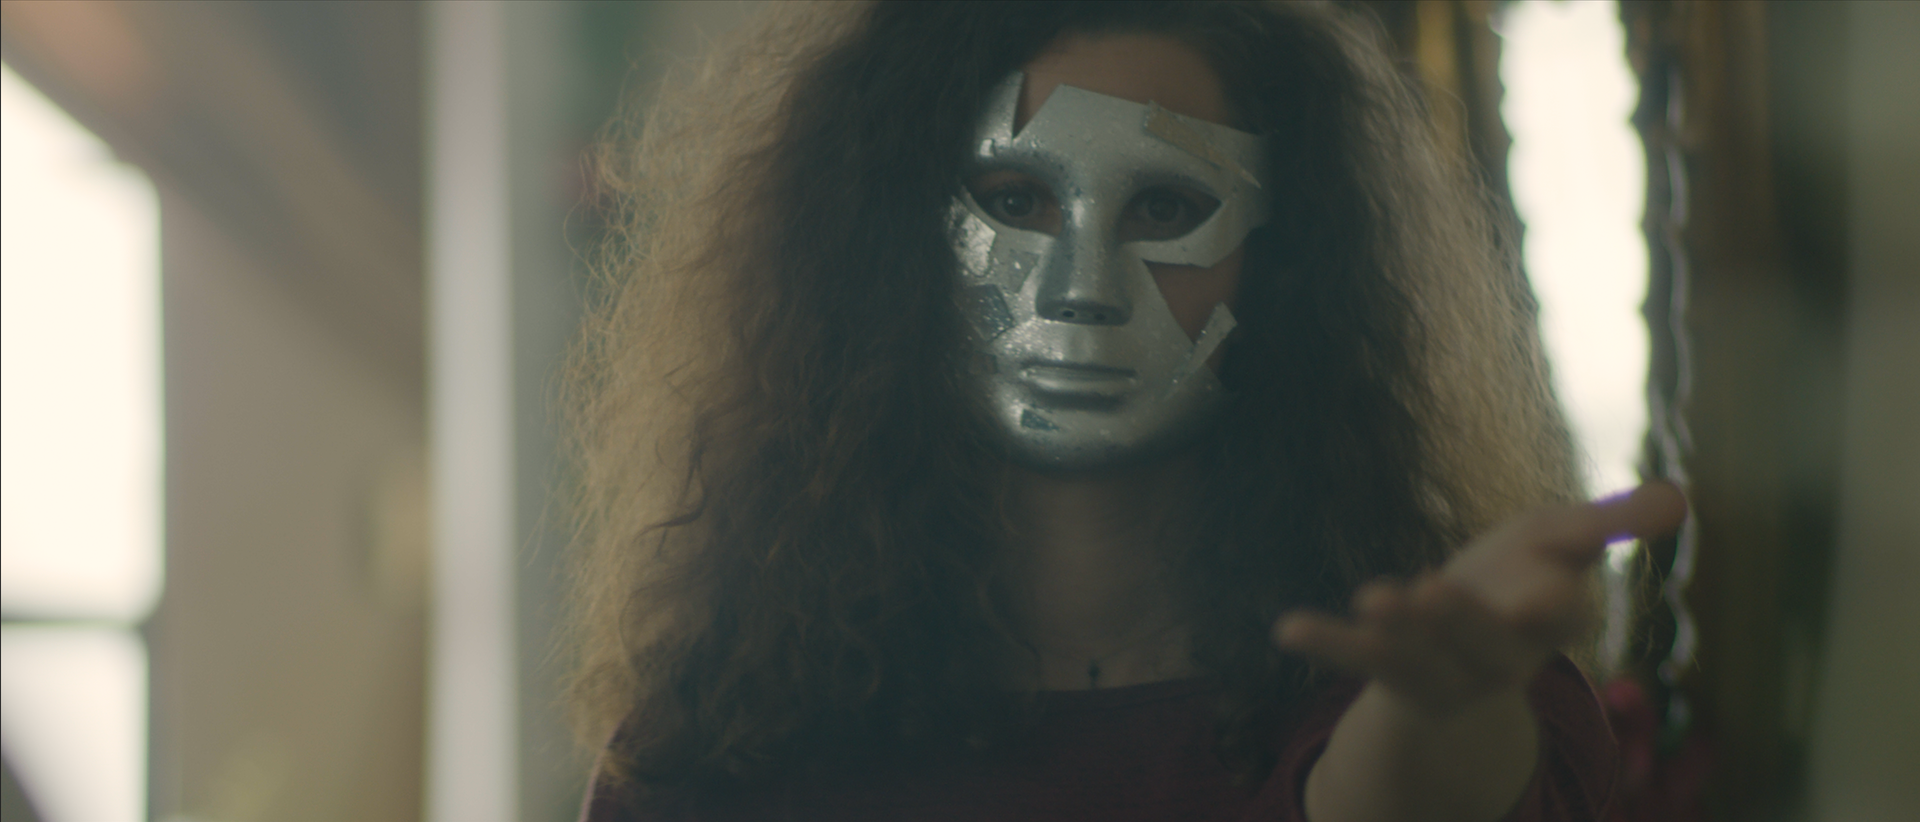 Masked Figure - Mask 2